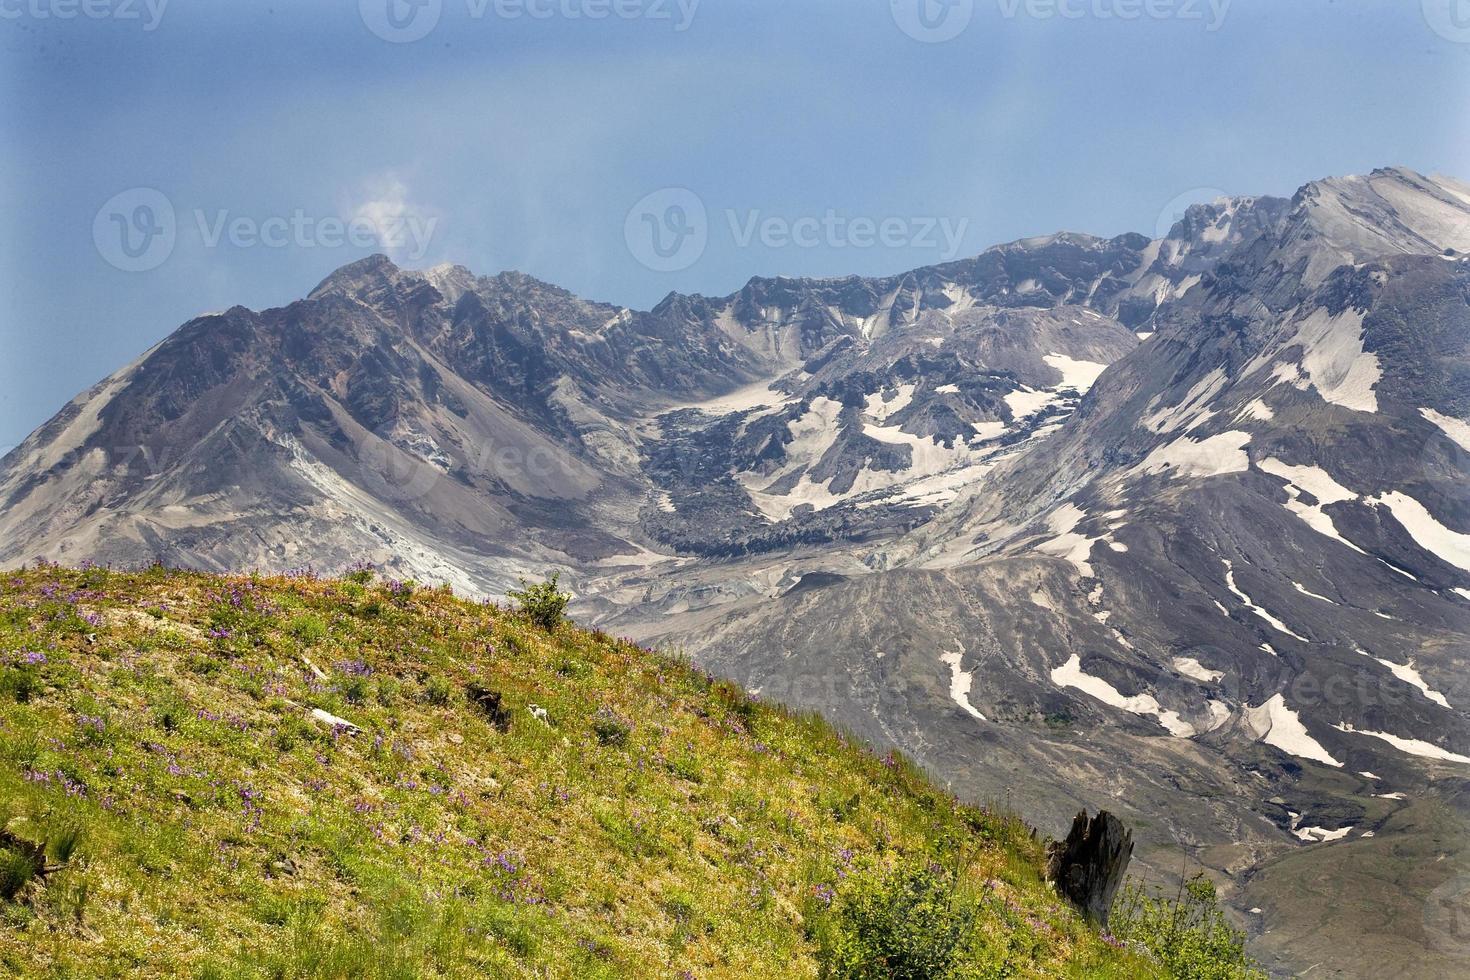 Caldera Lava Dome Mount Saint Helens Volcano National Park Washi photo